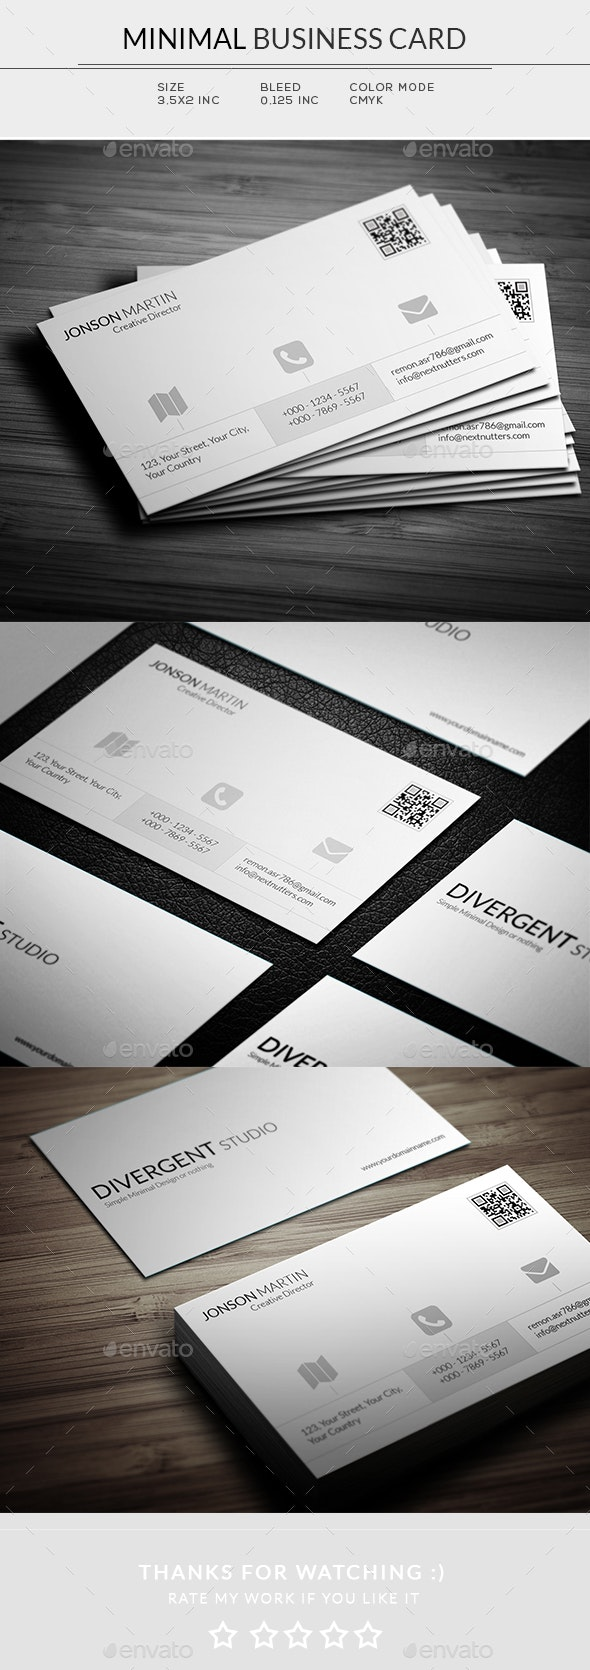 Minimal Business Card - Business Cards Print Templates